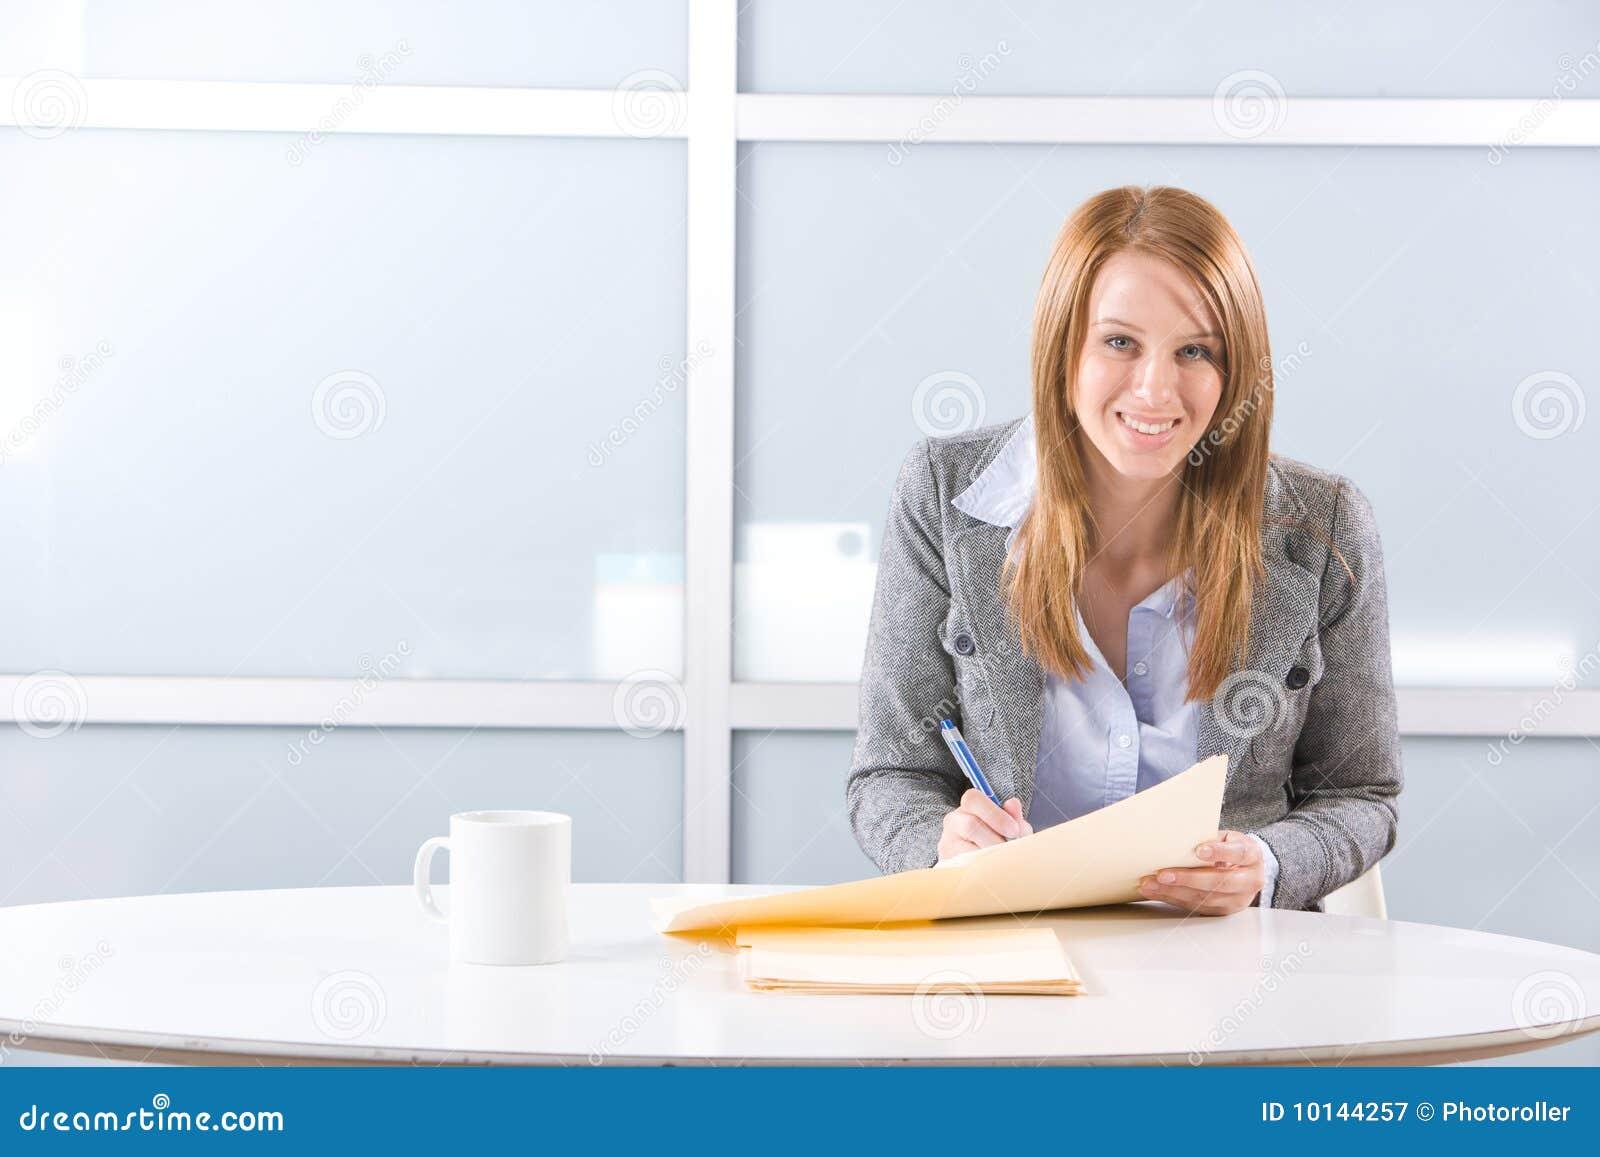 essay women in business List of good topics for a+ business essay writing, customessayordercom.